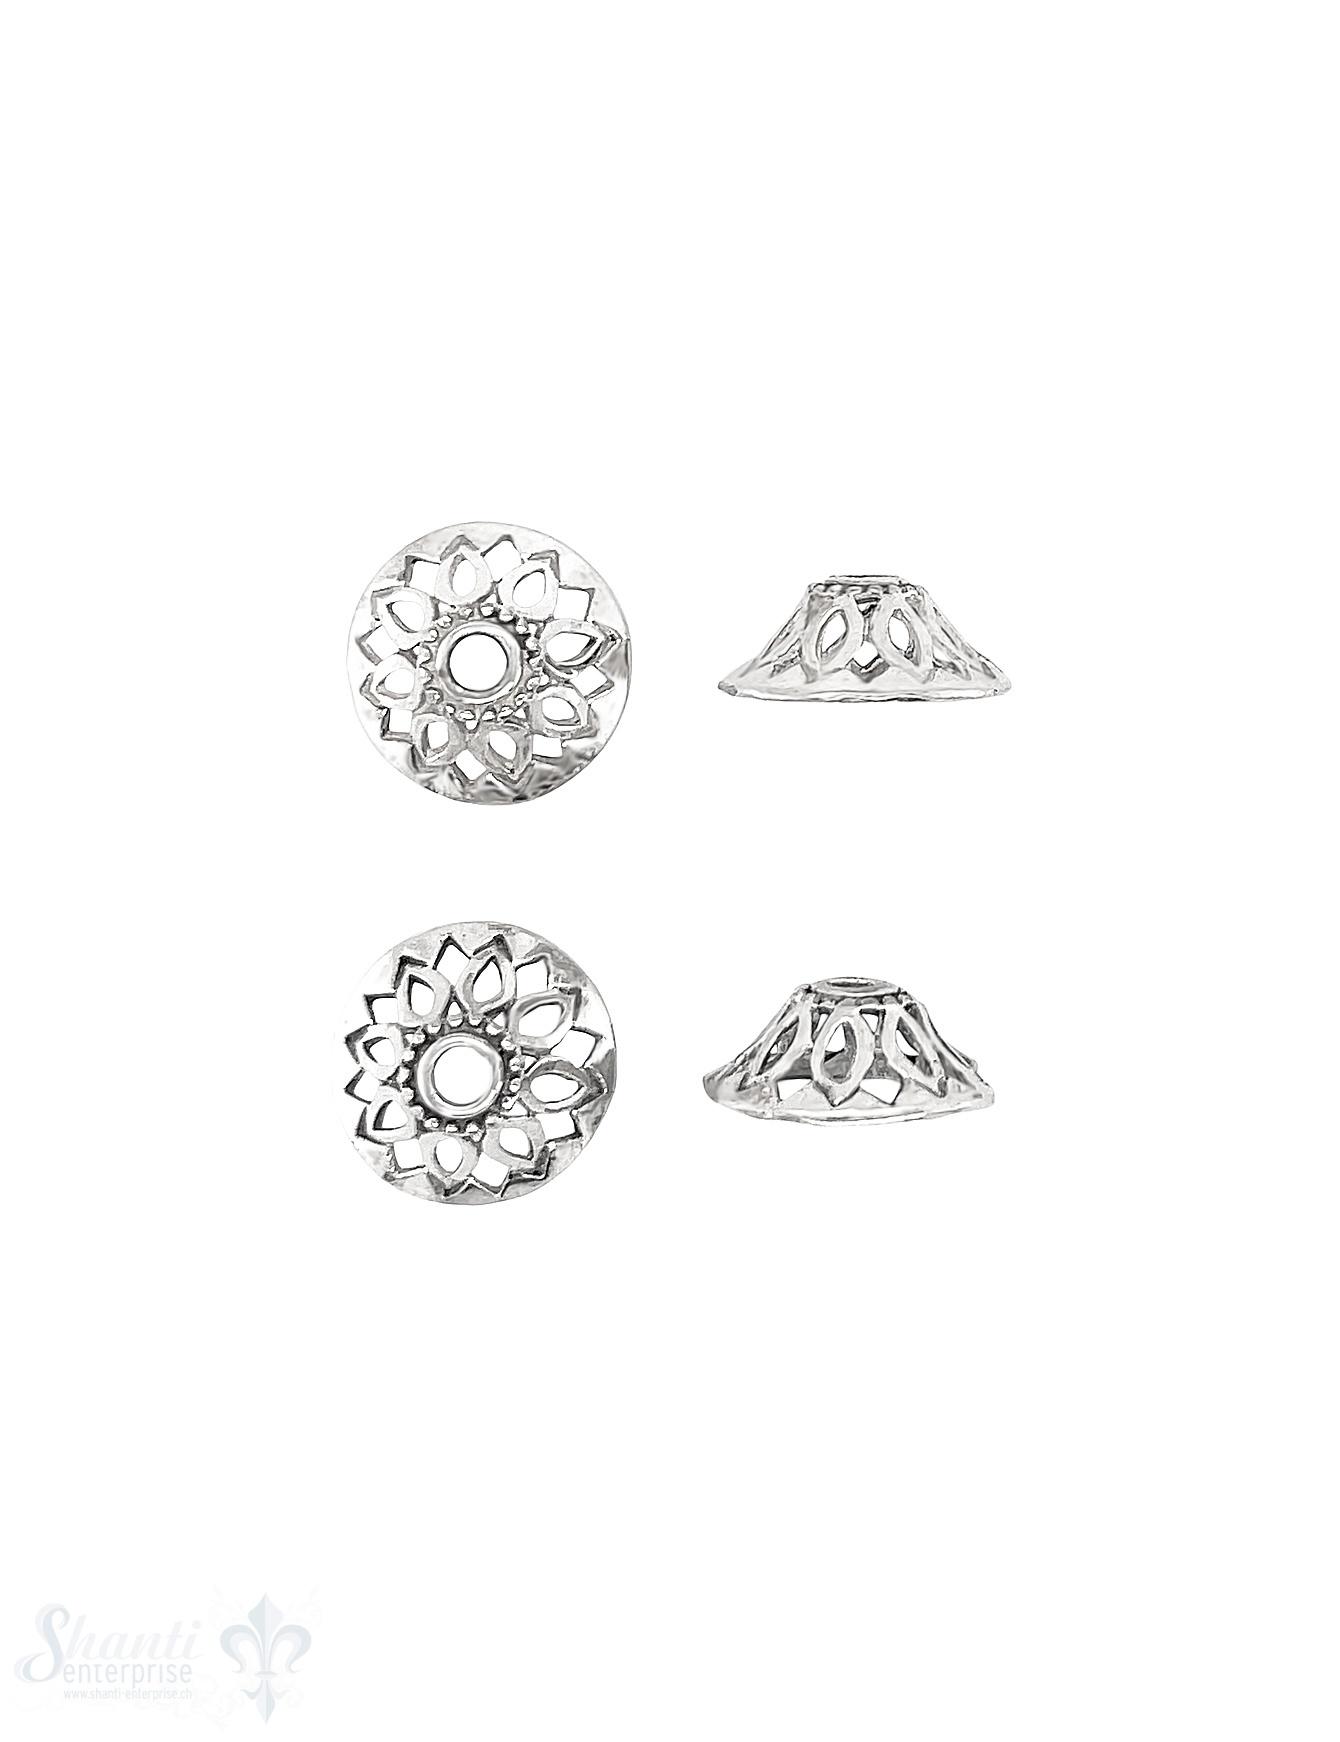 Blumen Perlkappe 14x5 mm Navette Muster ID 12 mm durchbrochen Silber 925 ID 2.5 mm 1 Pack = 6 Stk. ca. 4 gr.